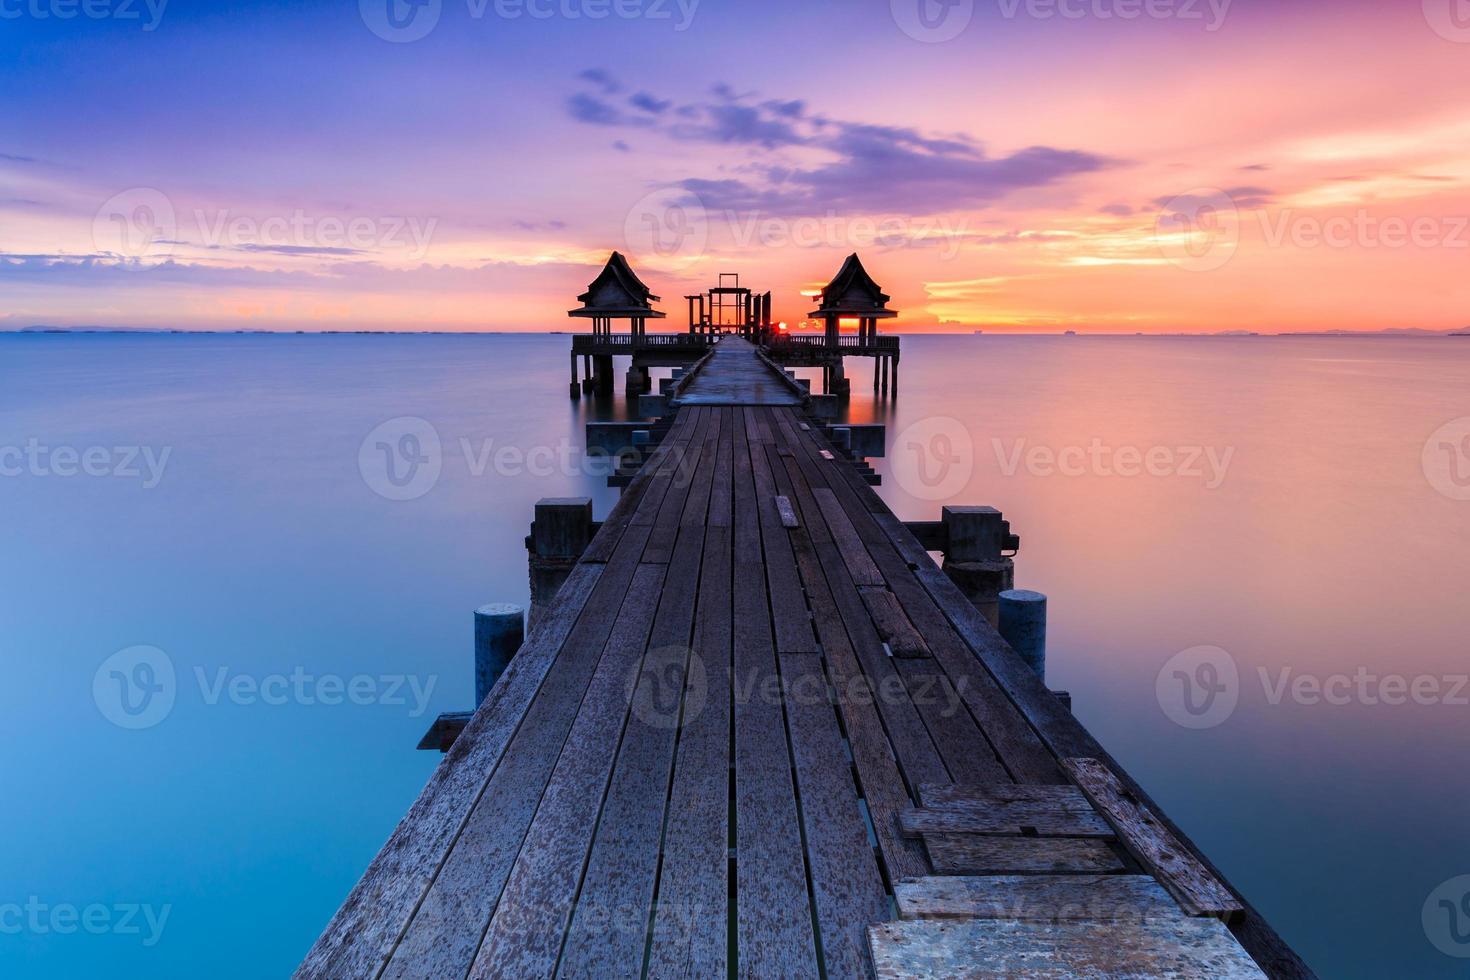 Wood bridge photo